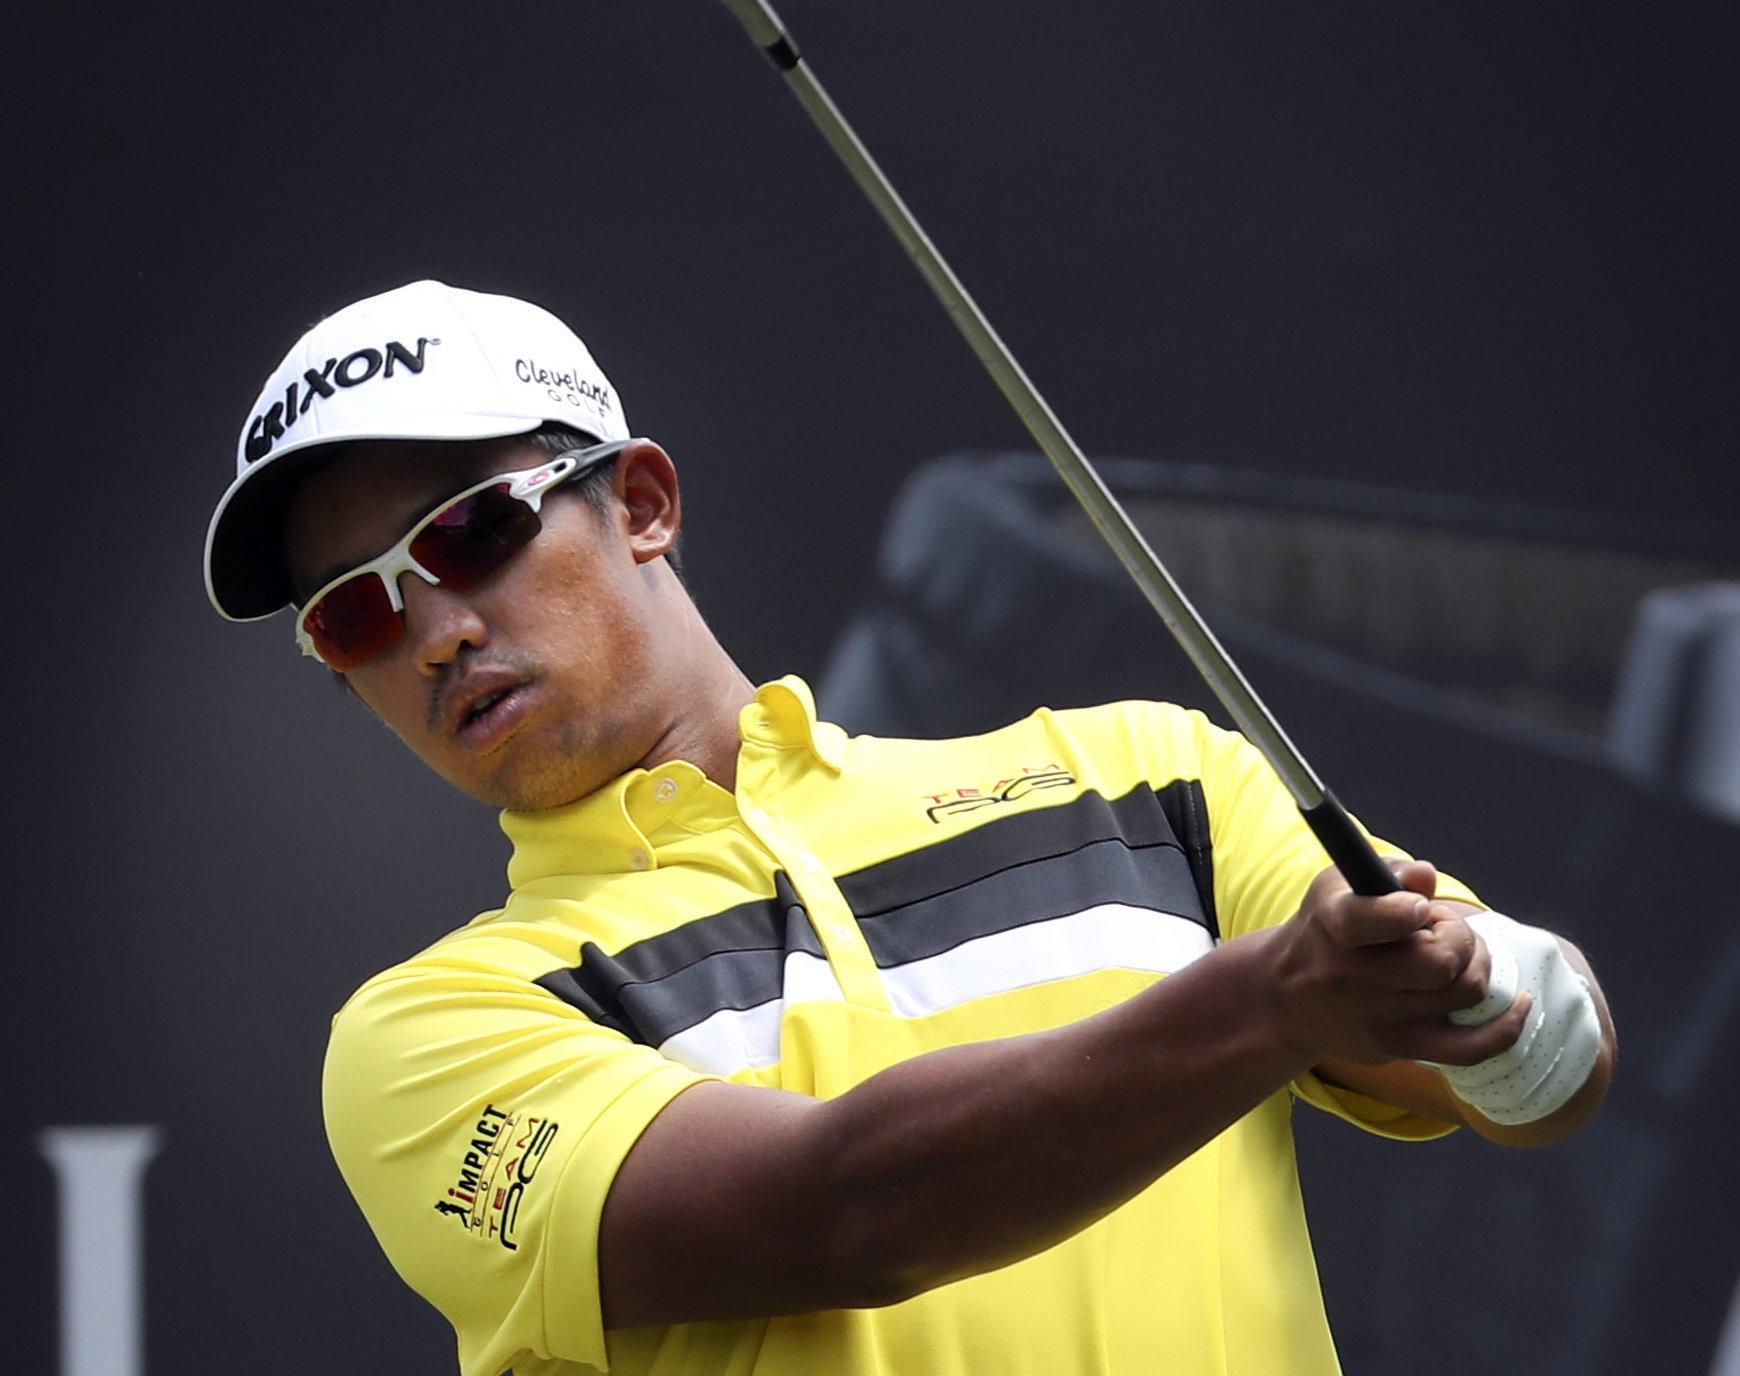 28-Year-Old Golfer Arie Irawan Found Dead In His Hotel